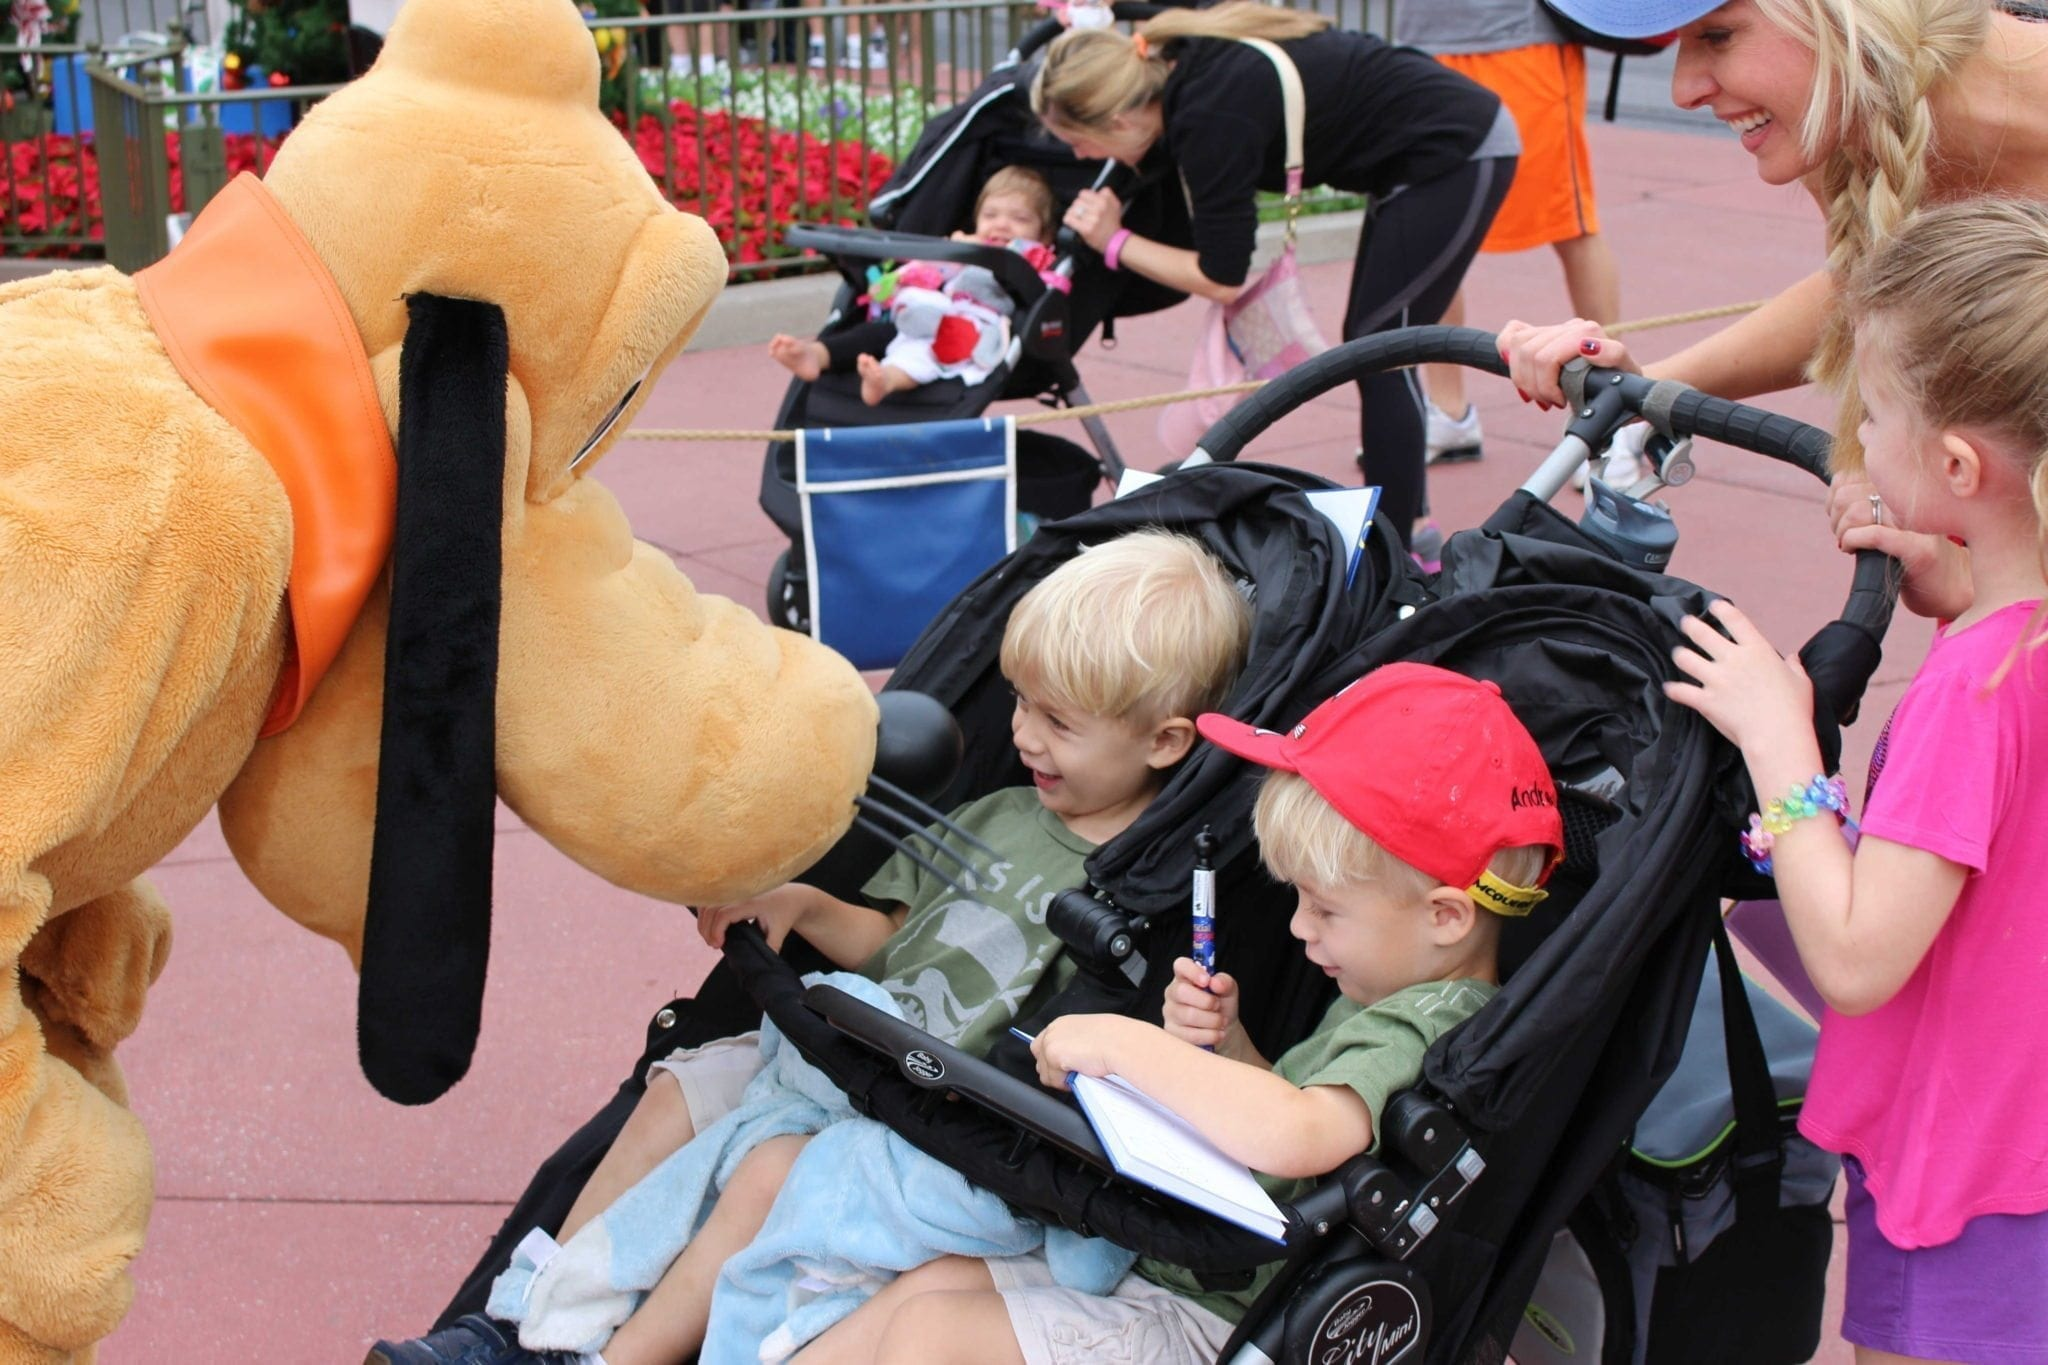 Disney autograph book. A Disney Magic Kingdoms guide to top 5 tips for Disney World days.